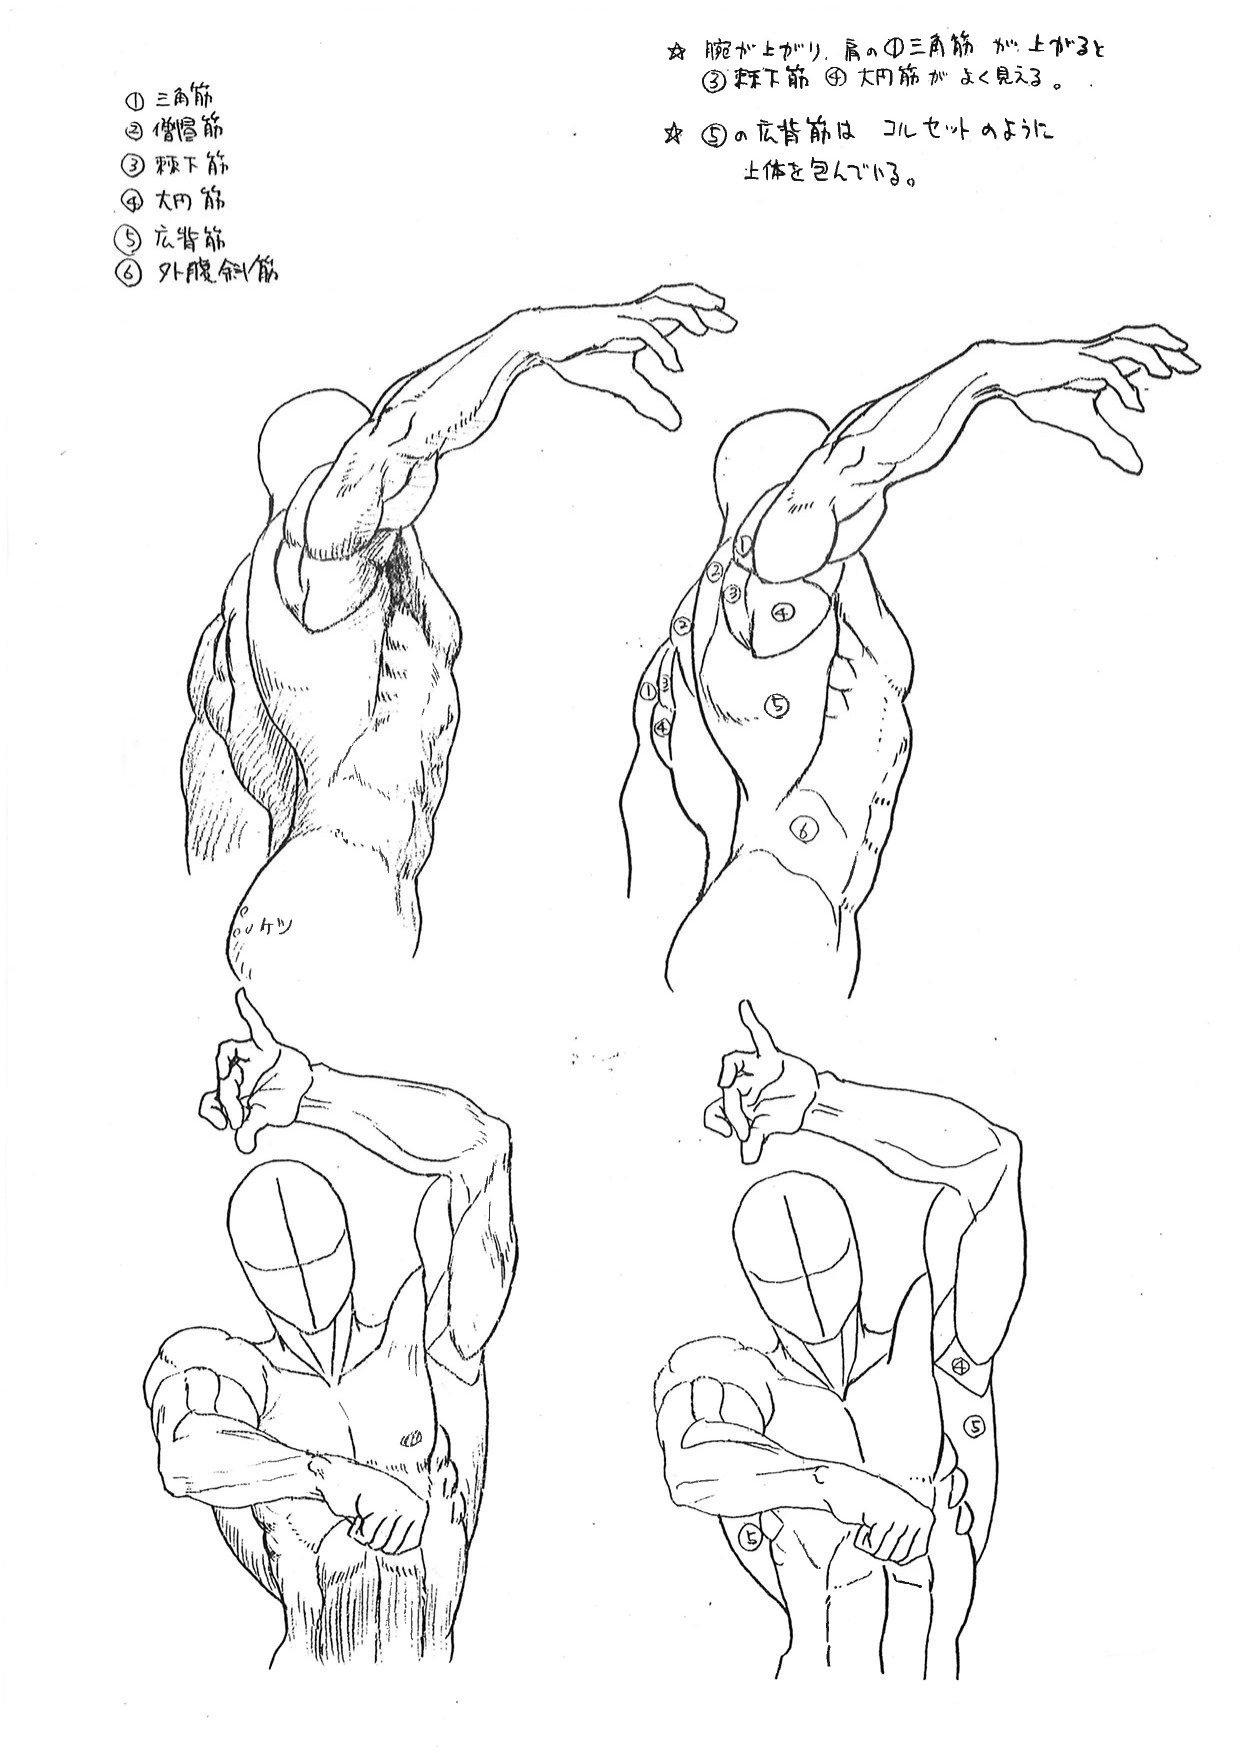 Capcom's Street Fighter Anatomy Guide